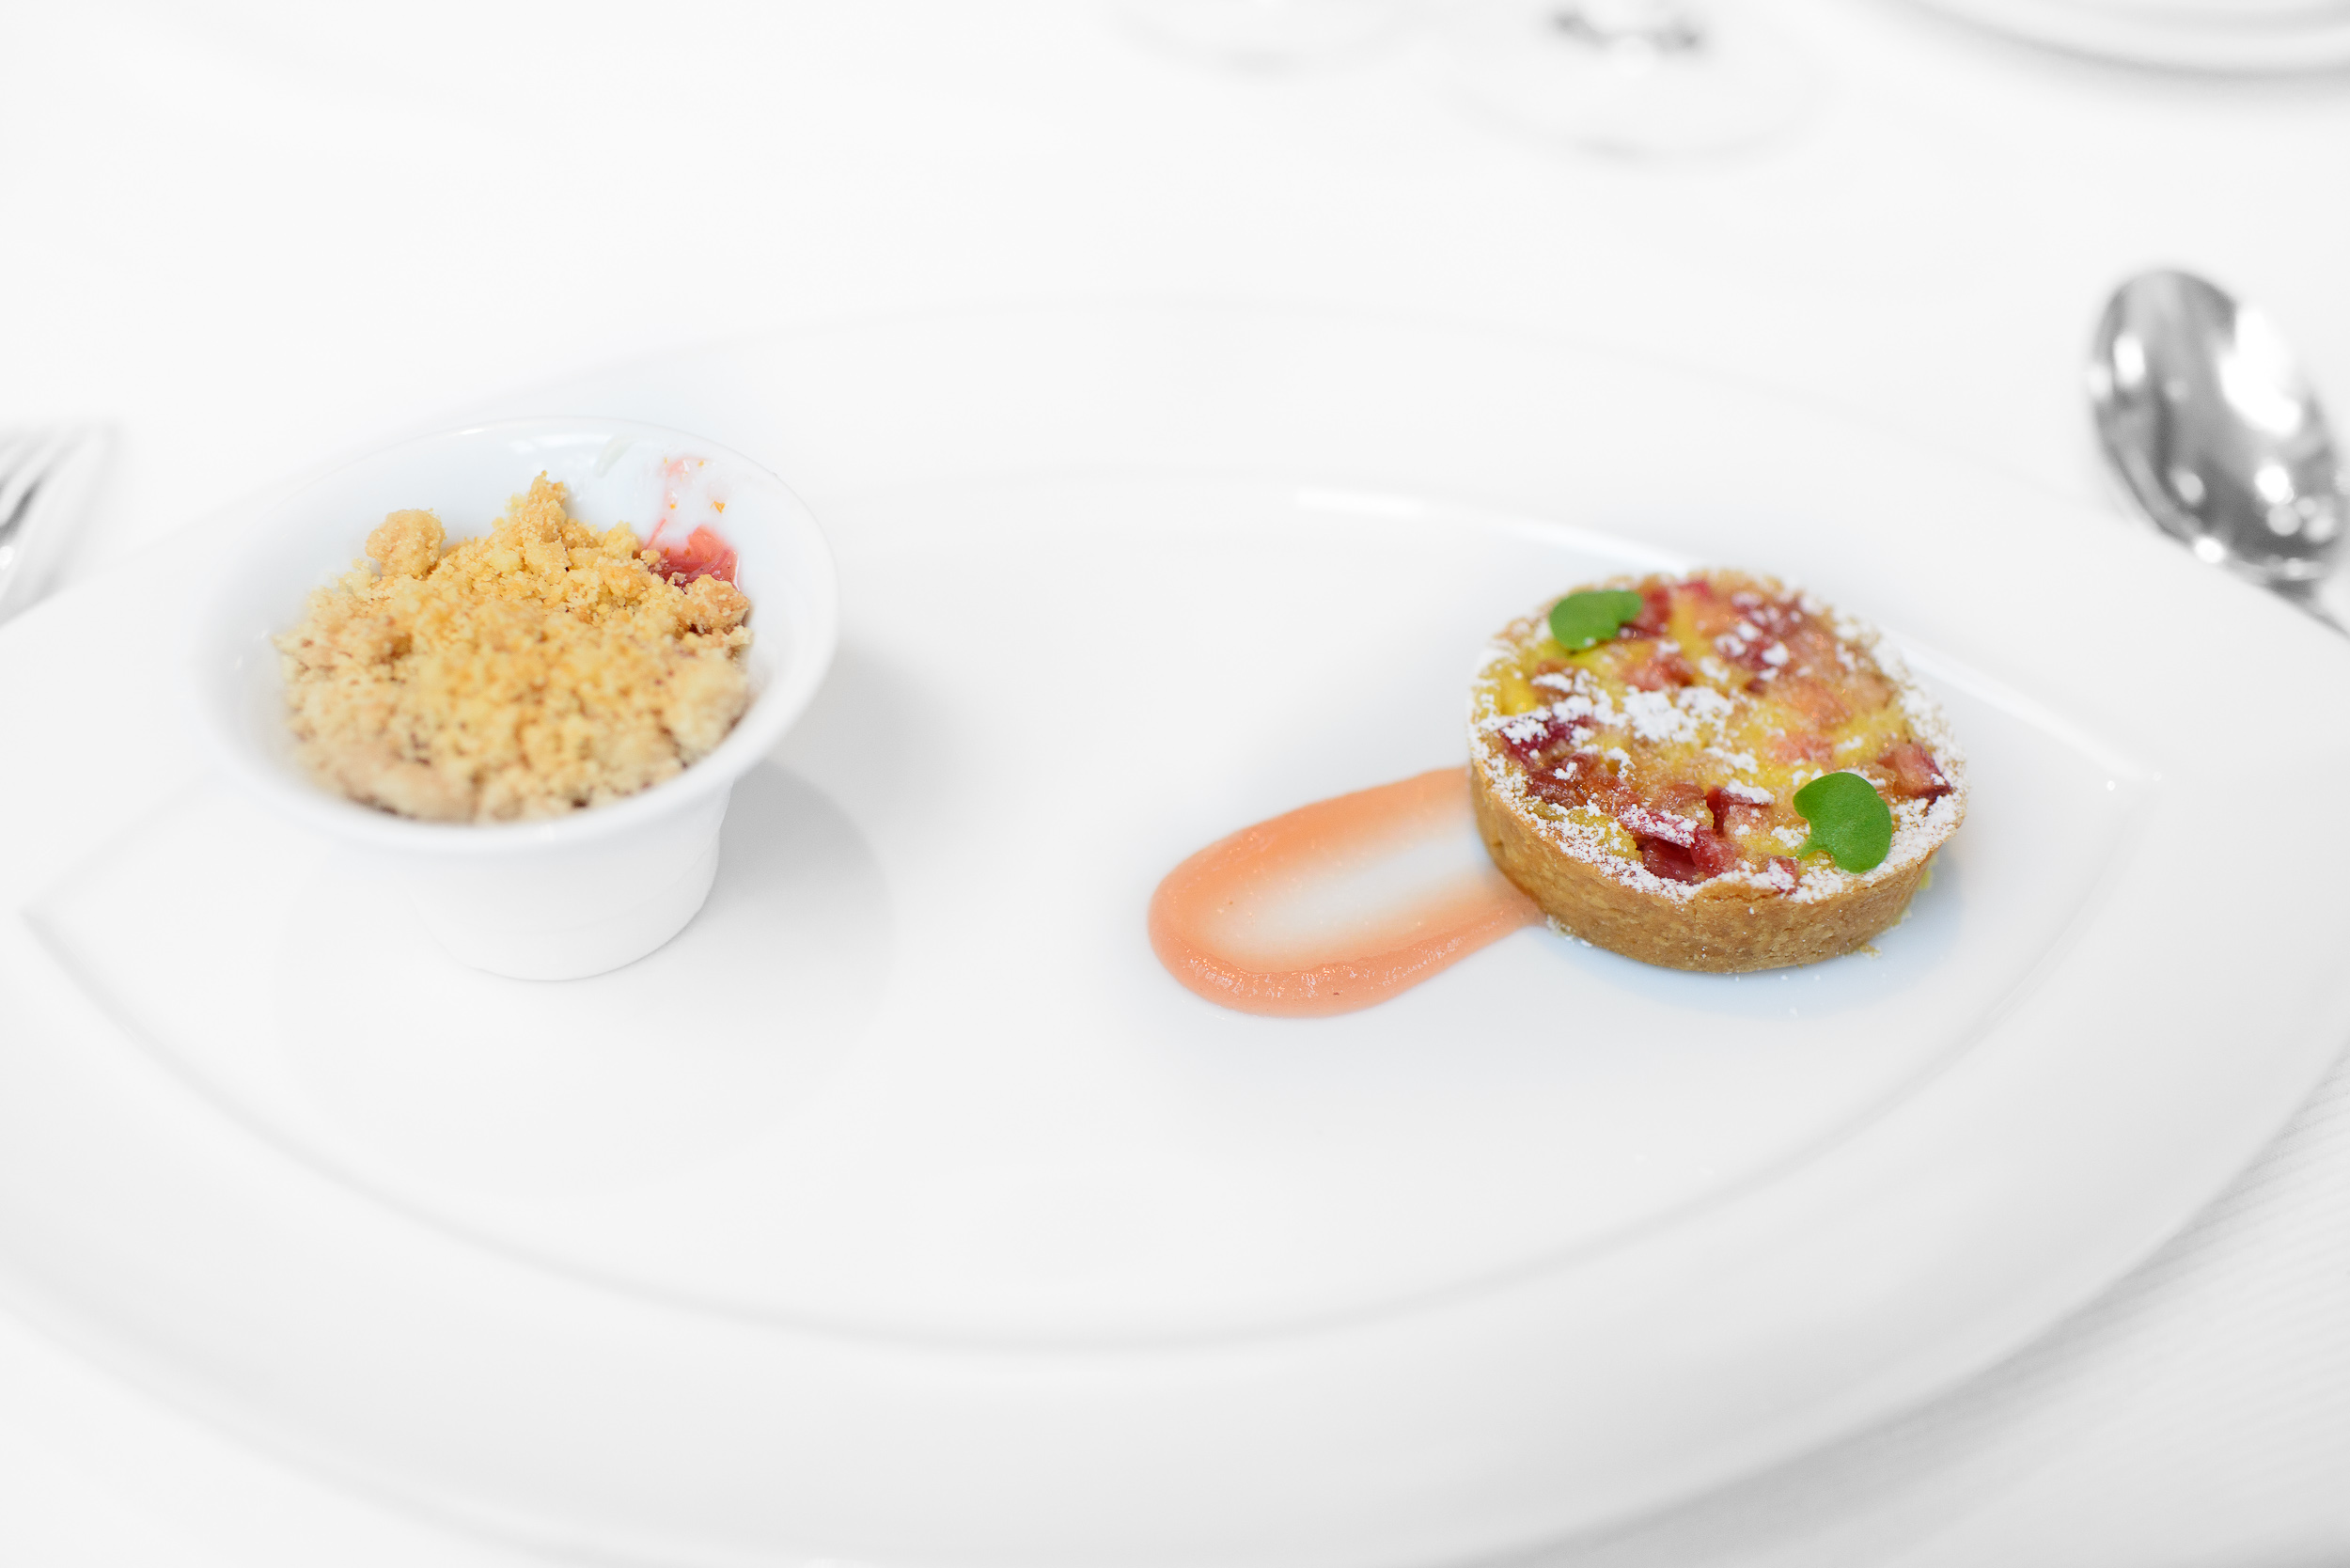 Rhubarb - orange flower yogurt, almond crumble and spiced rhubar